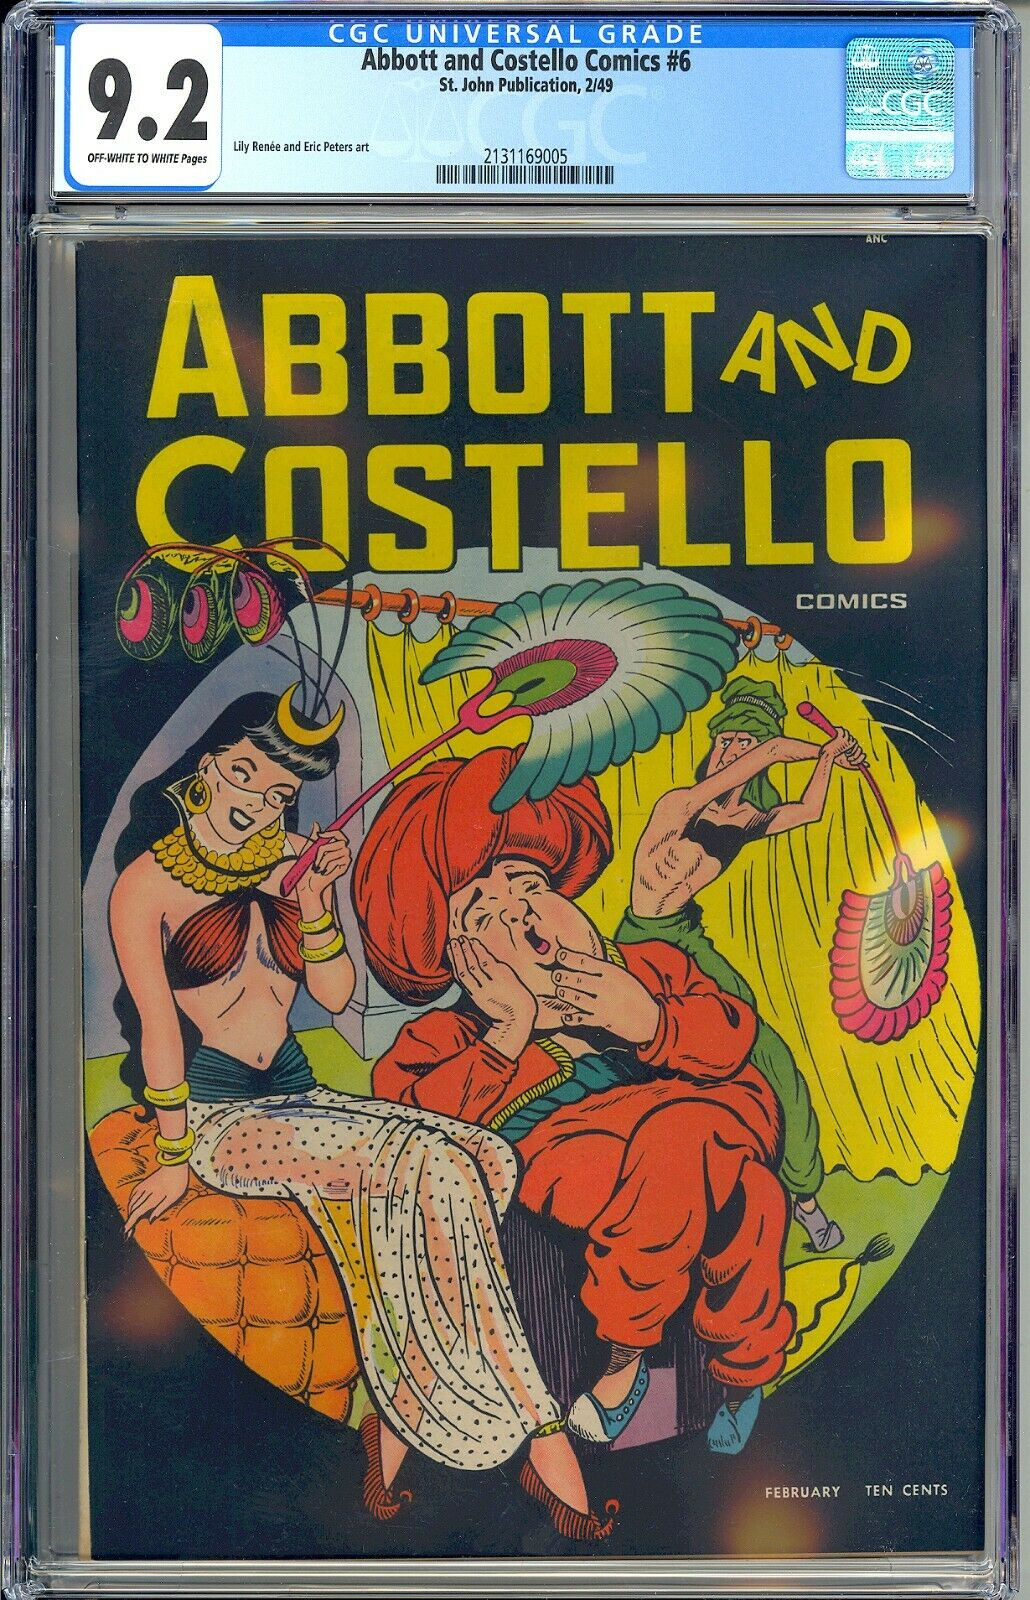 Abbott and Costello Comics 6 Highest Graded Copy Good Girl St John 1949 CGC 92